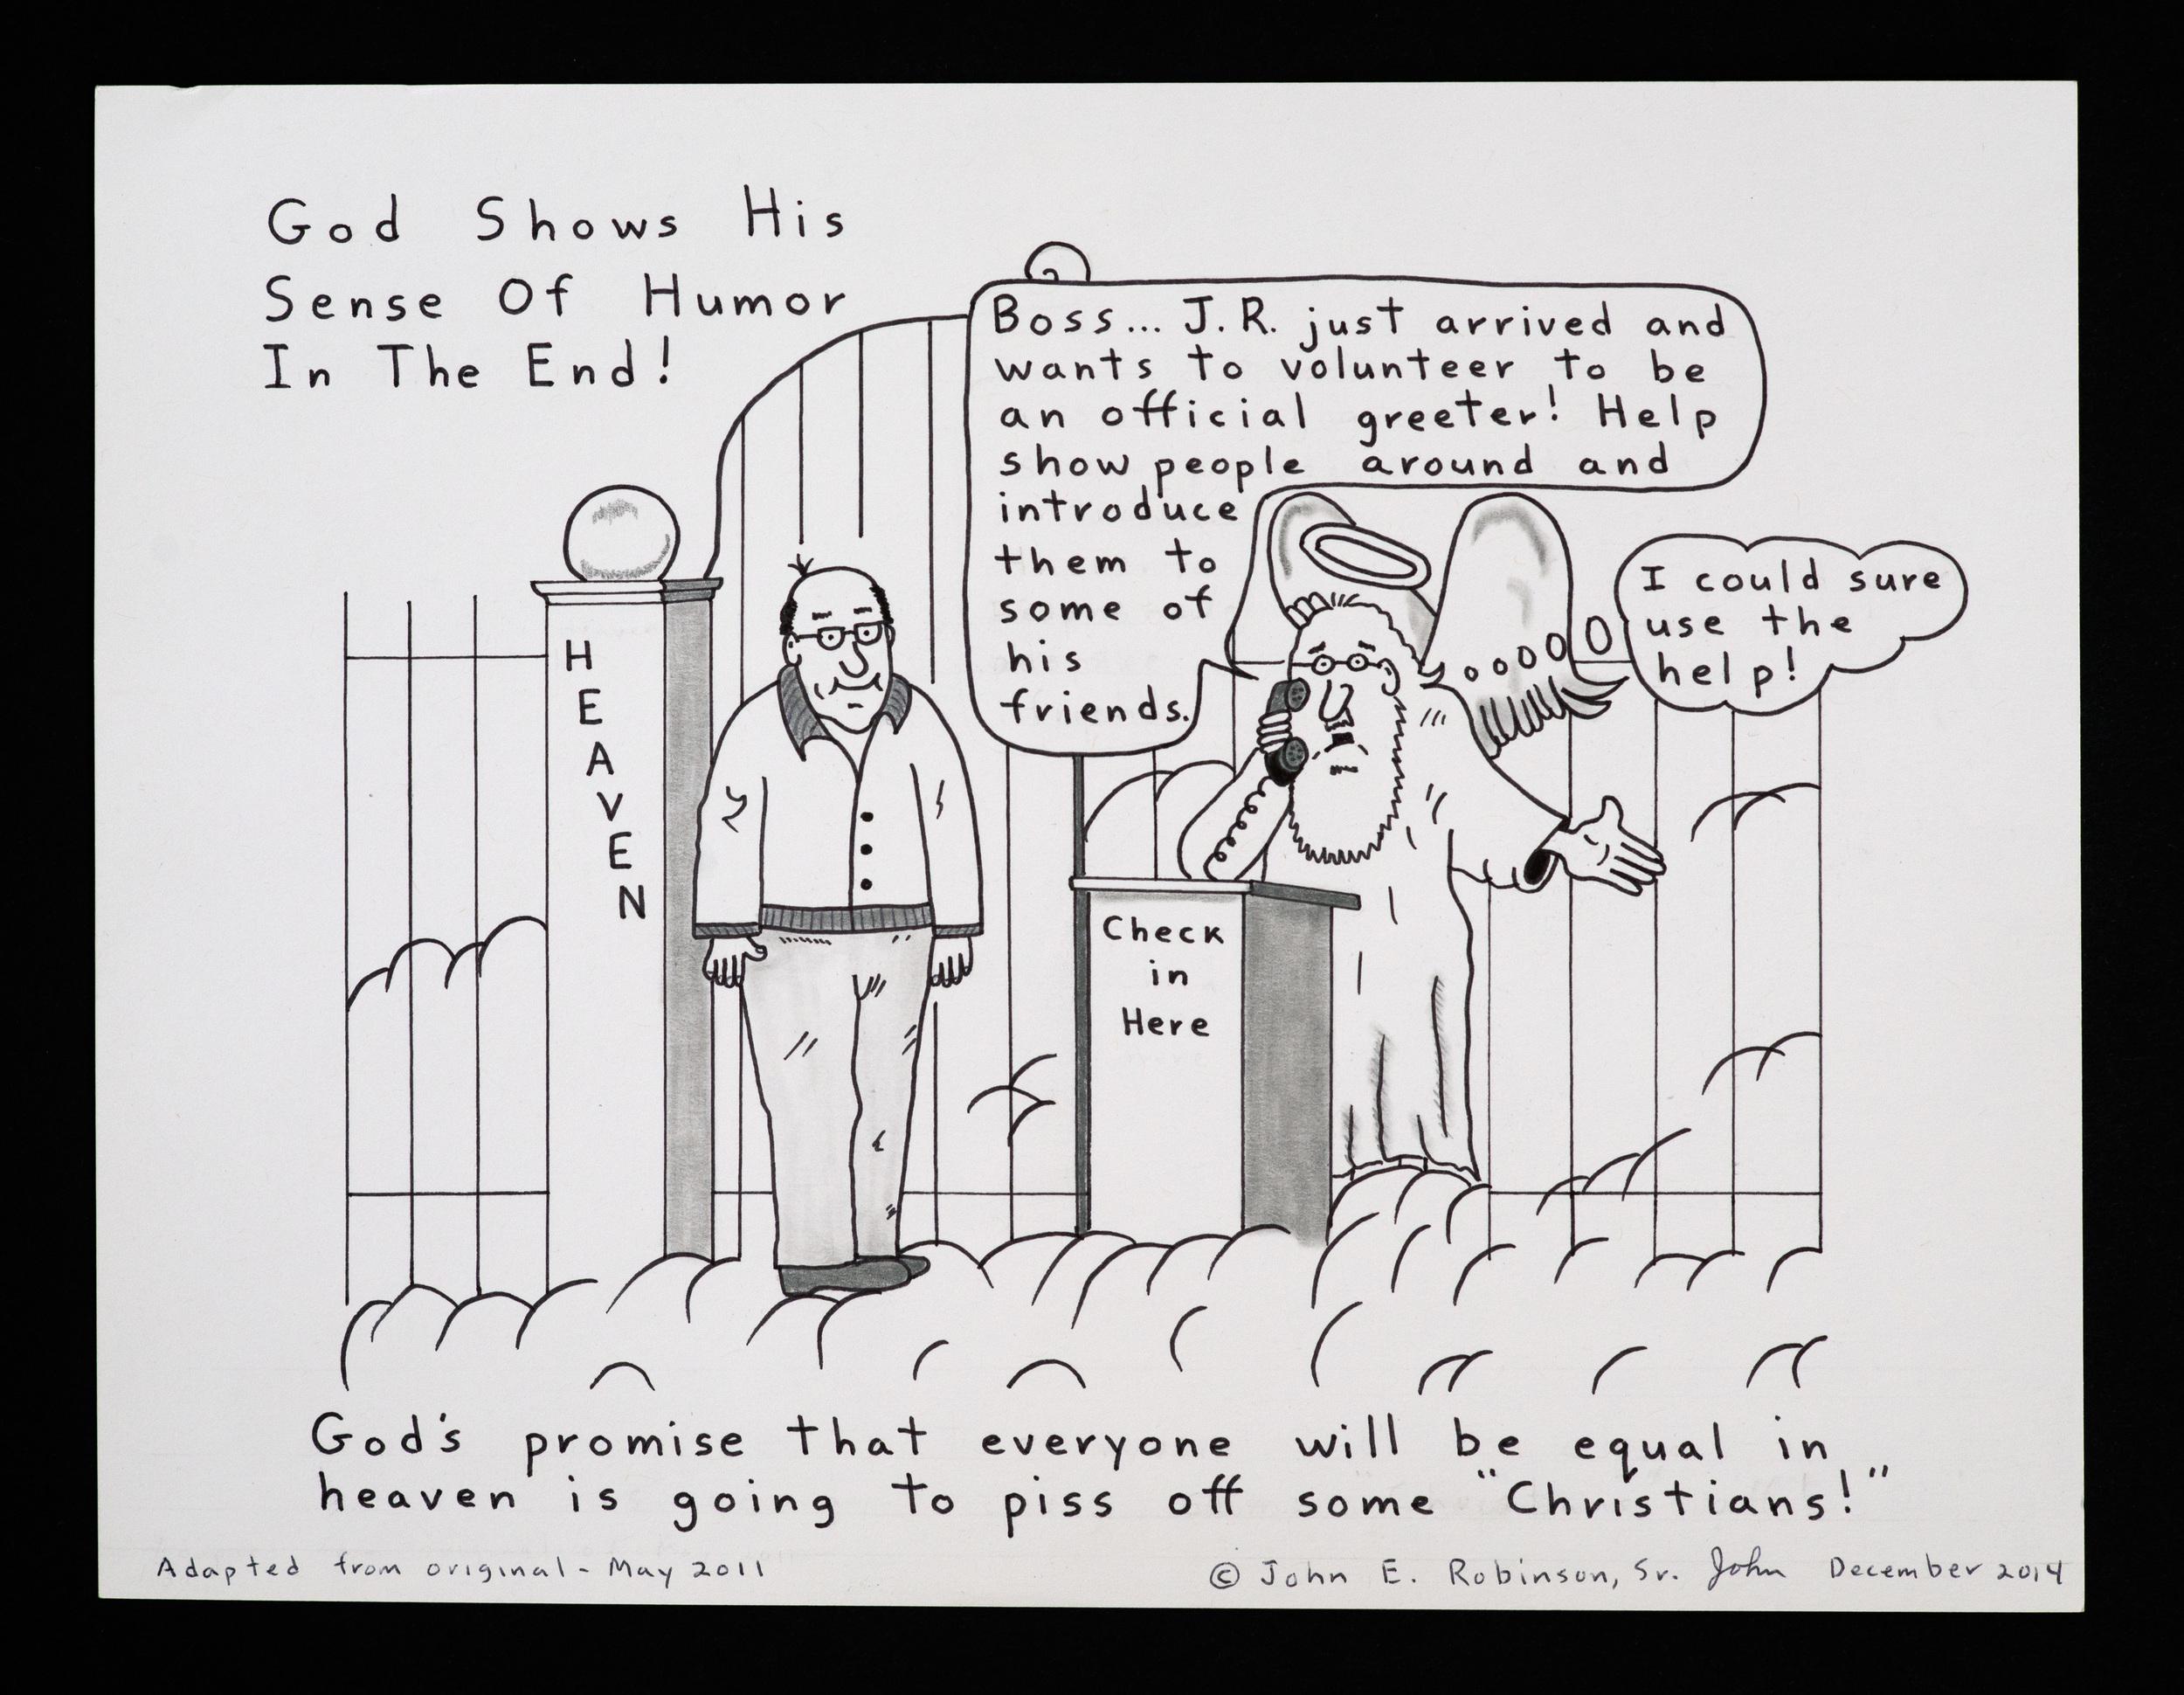 God's Sense of Humor